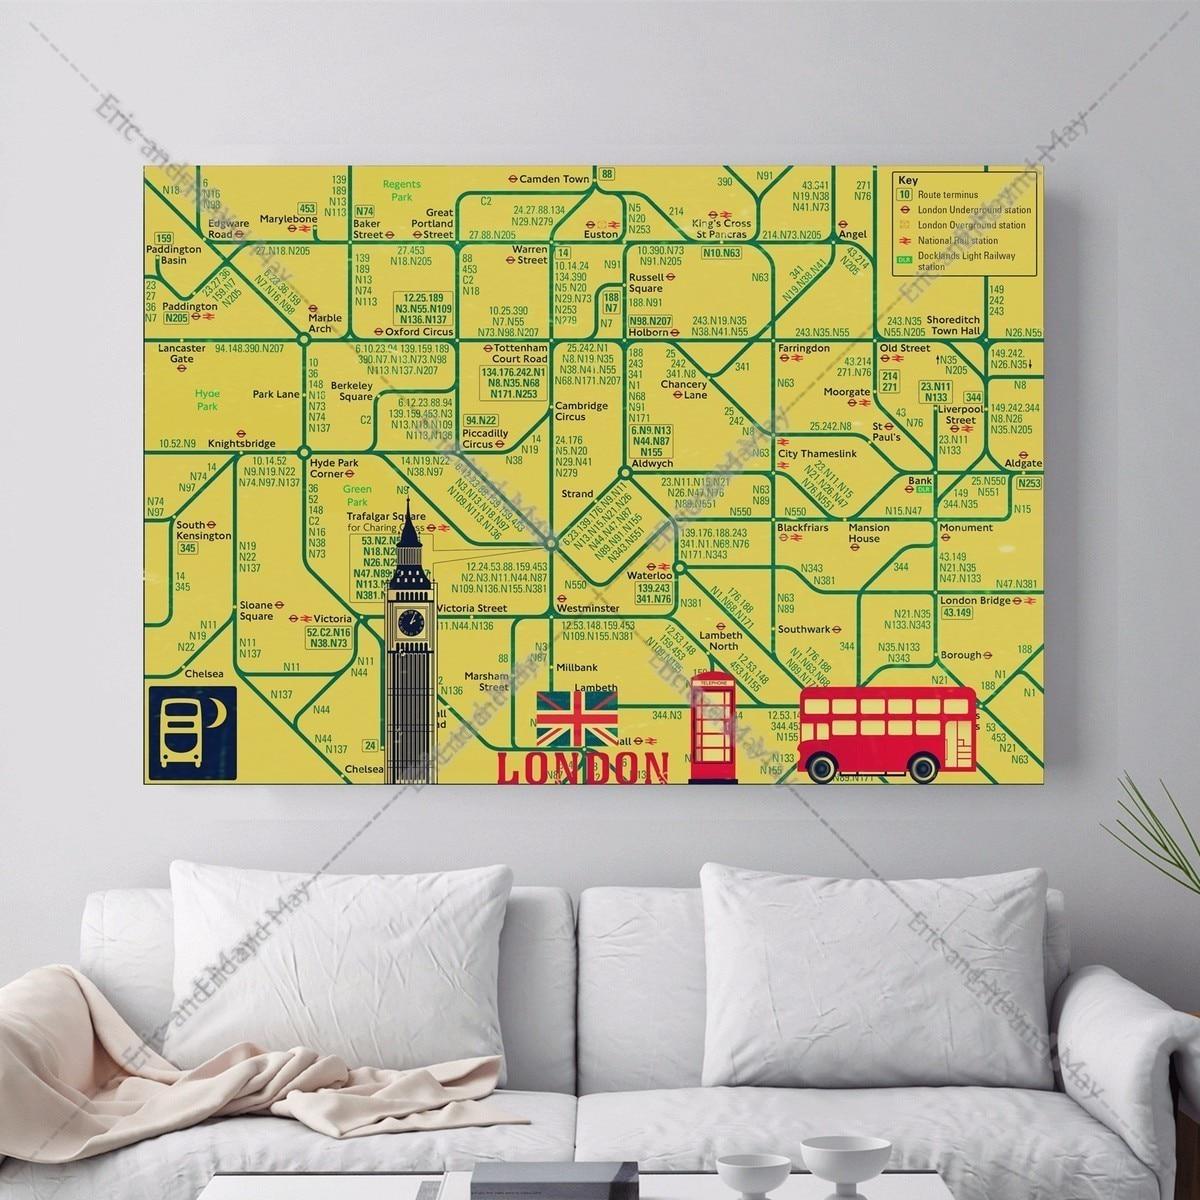 Amazing Travel Wall Art Photos - The Wall Art Decorations ...